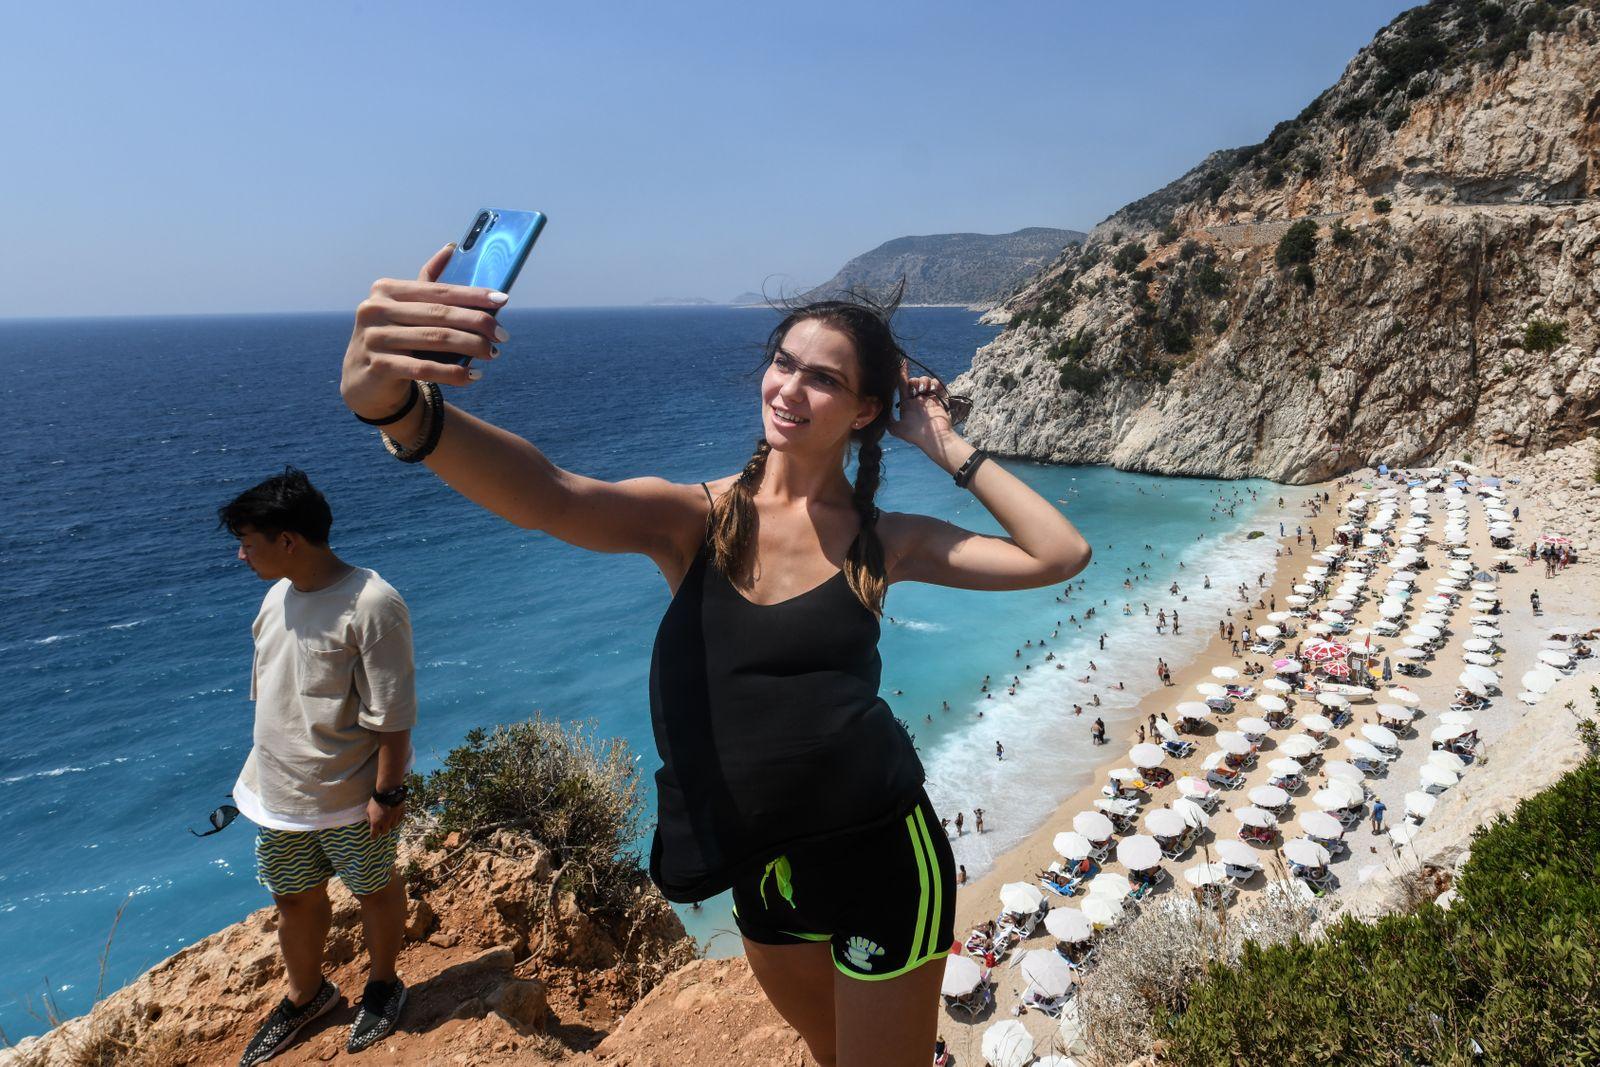 Turkish Resort Towns Swell Following Eid al-Adha Bayram